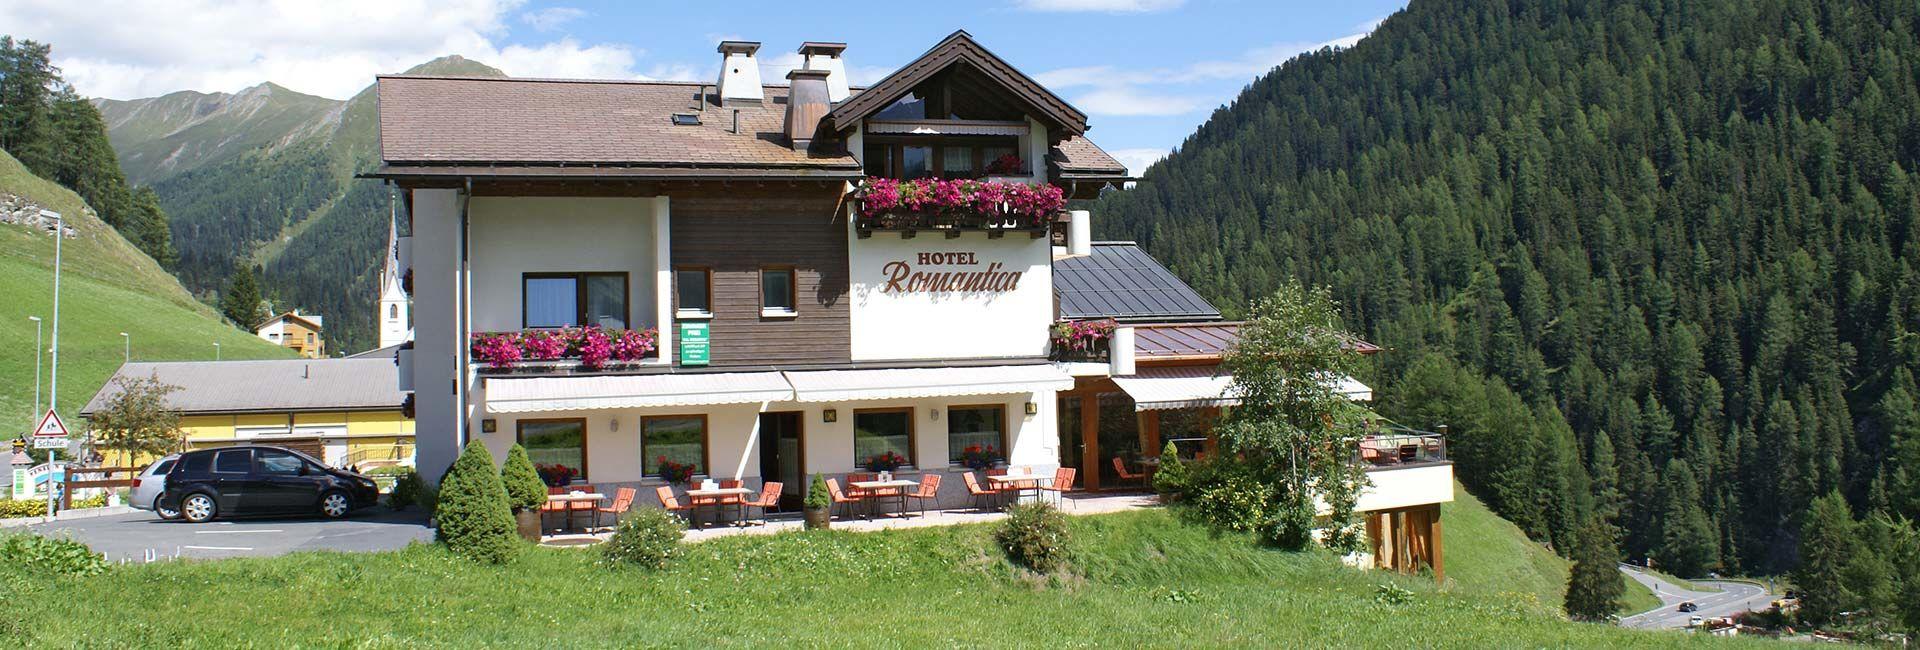 Samnaun - Hotel Romantica, Restaurant, Dependance